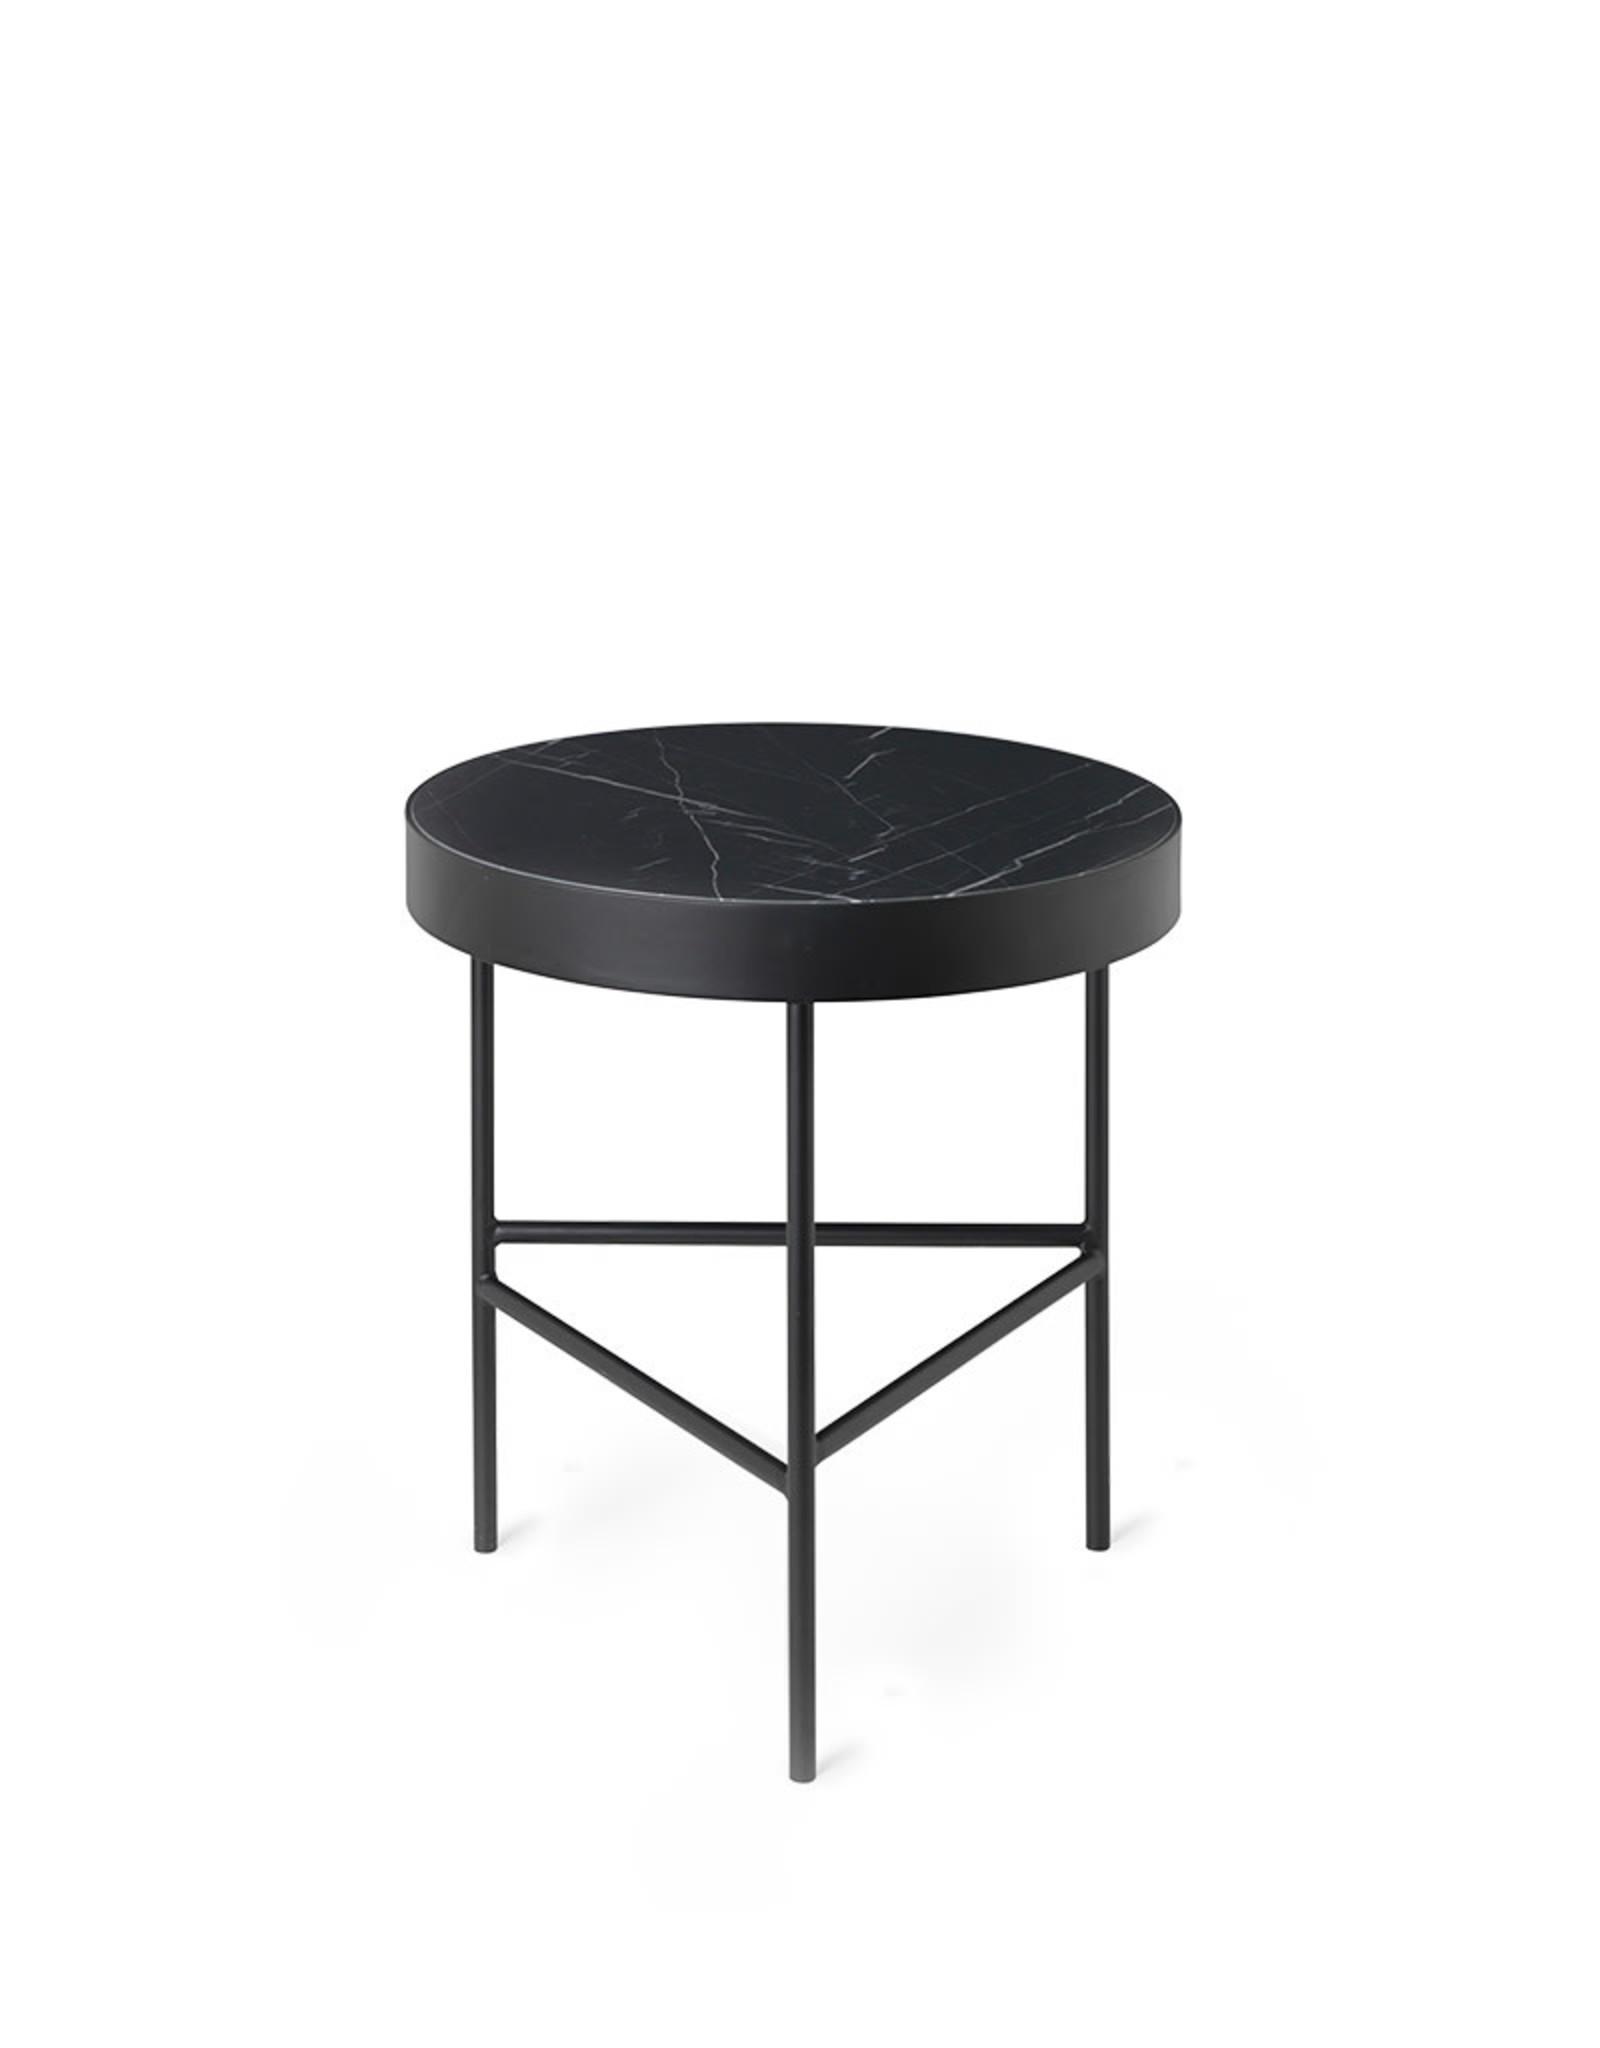 FERM LIVING FERM LIVING Marble Table - Medium – Black